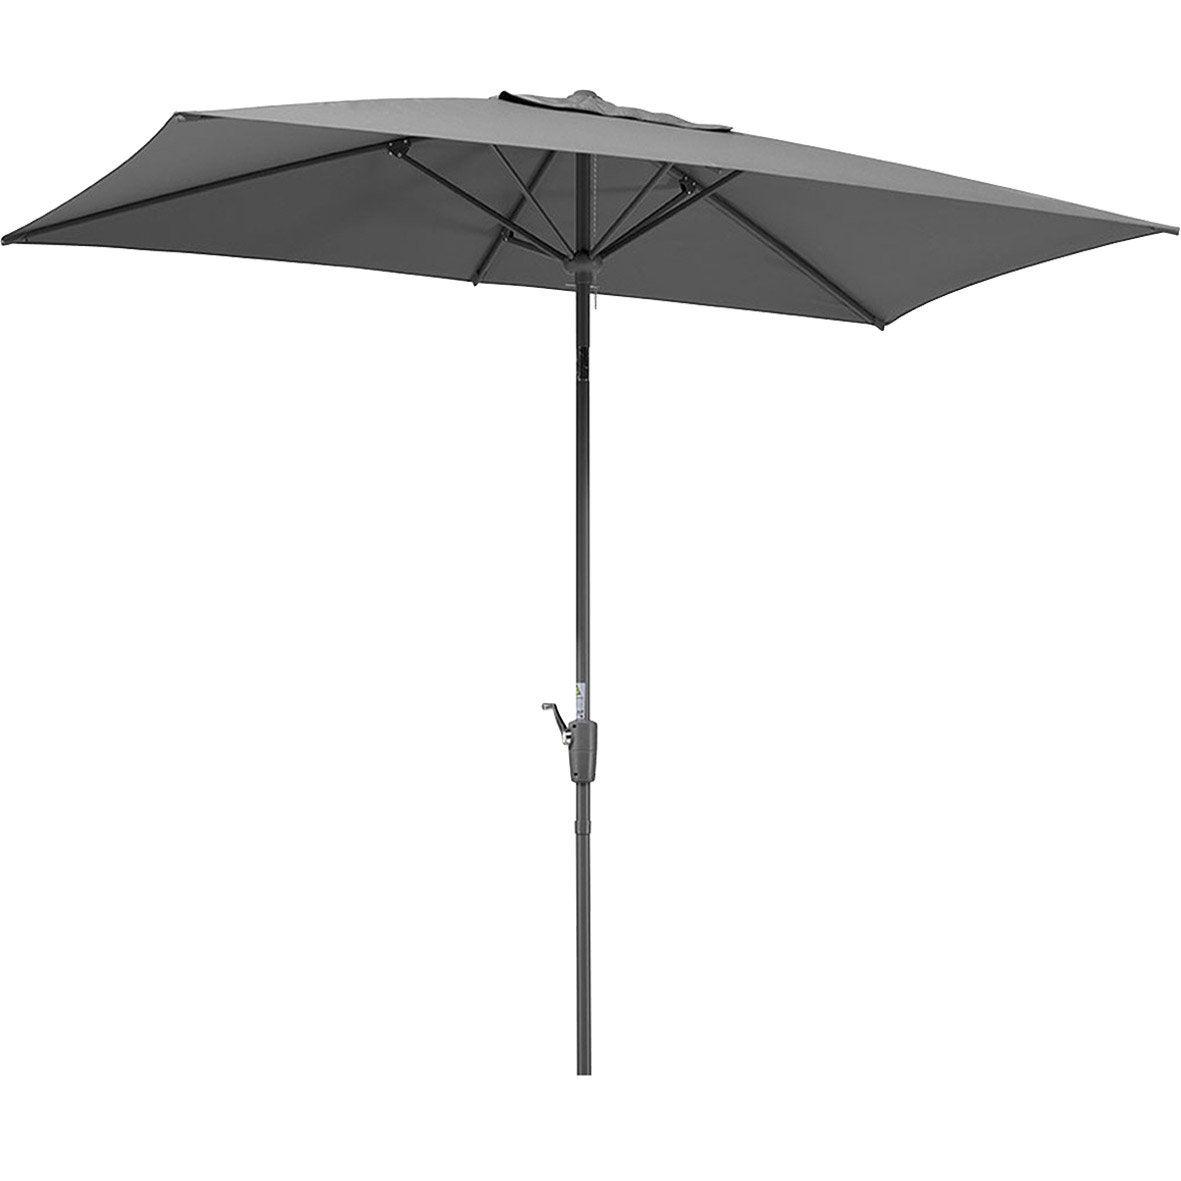 Parasol droit tunis anthracite rectangulaire x cm leroy merlin - Rode leroy merlin parasol ...